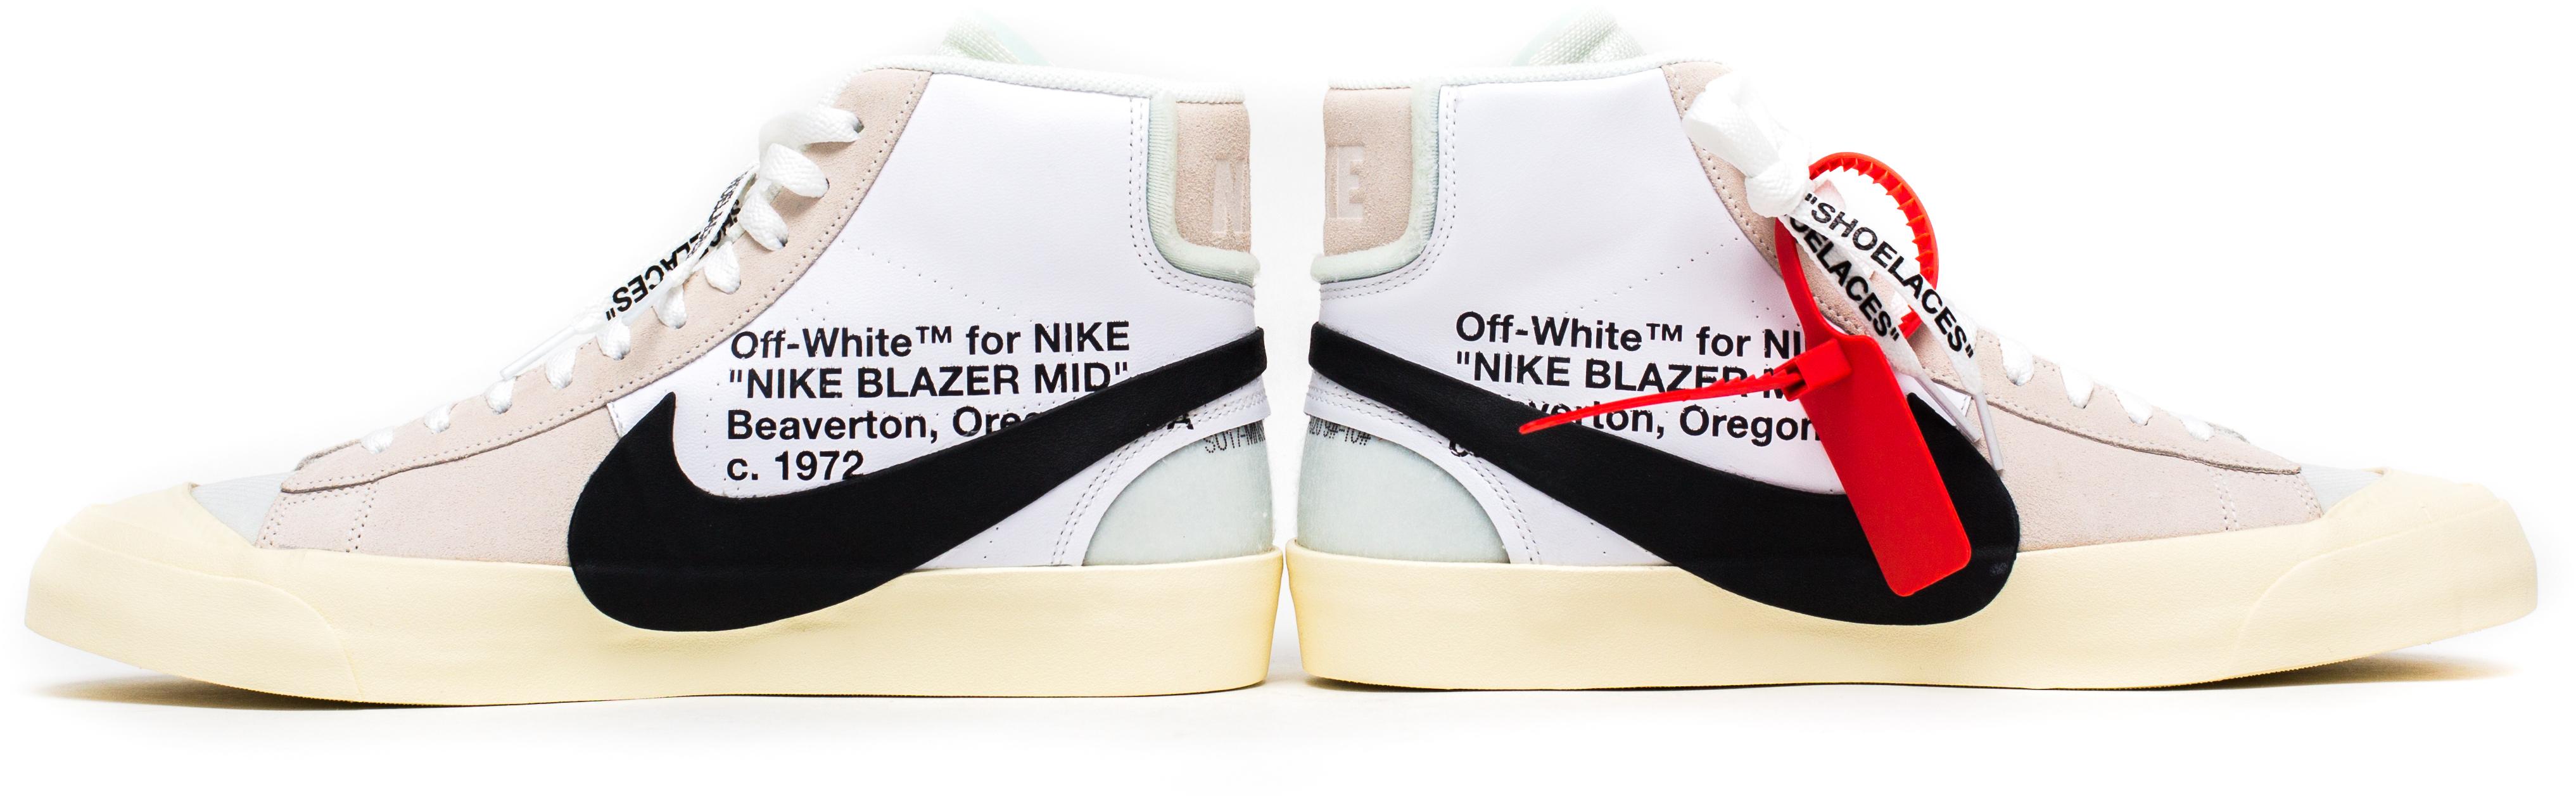 white nike blazers